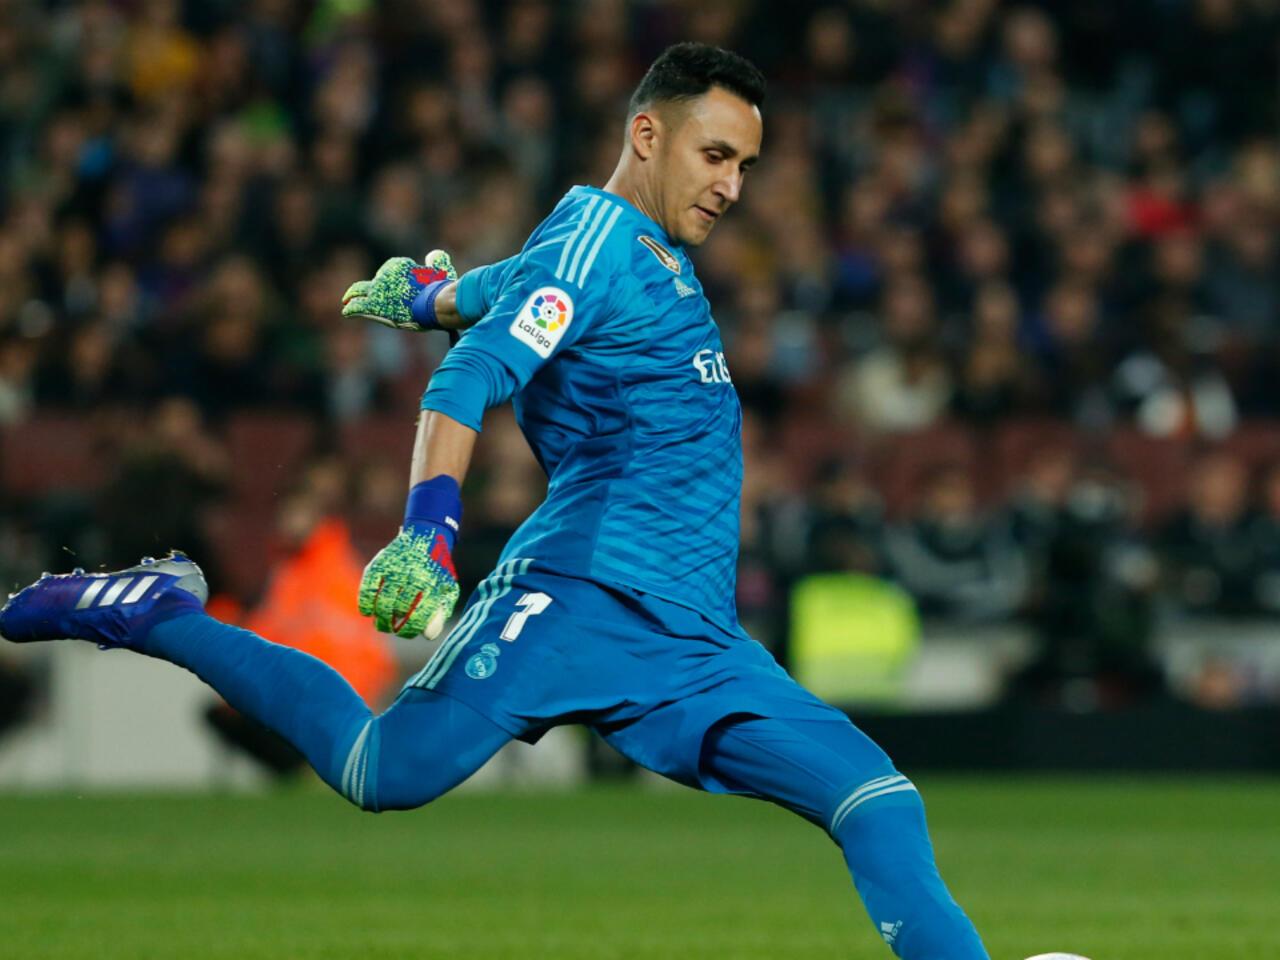 Psg Sign Costa Rican Goalkeeper Navas From Real Madrid